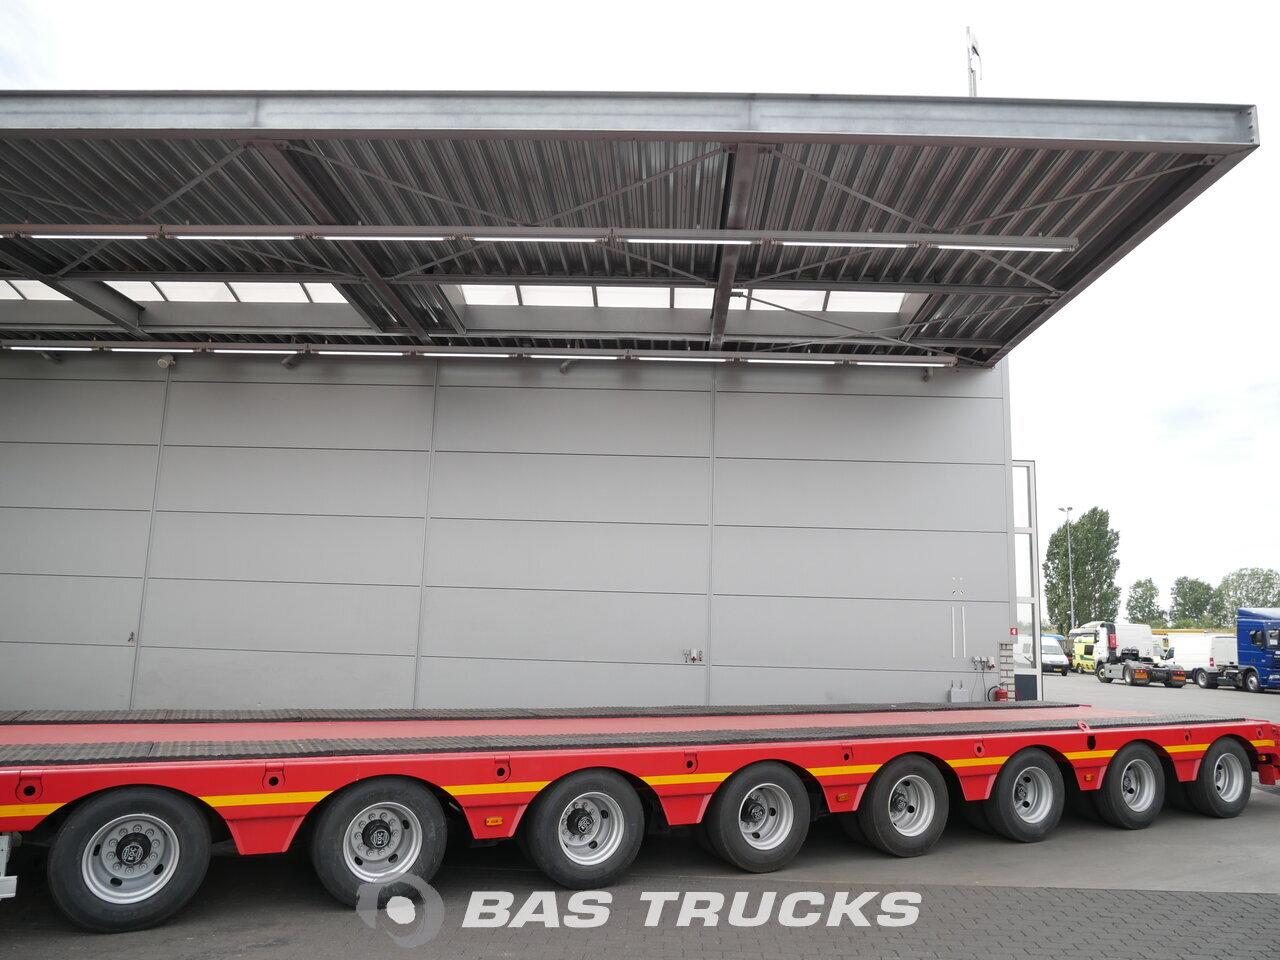 photo of New Semi-trailer GURLESENYIL  Ausziebar Bis 23m80 5x Lenkachse GLY8 8 Axels